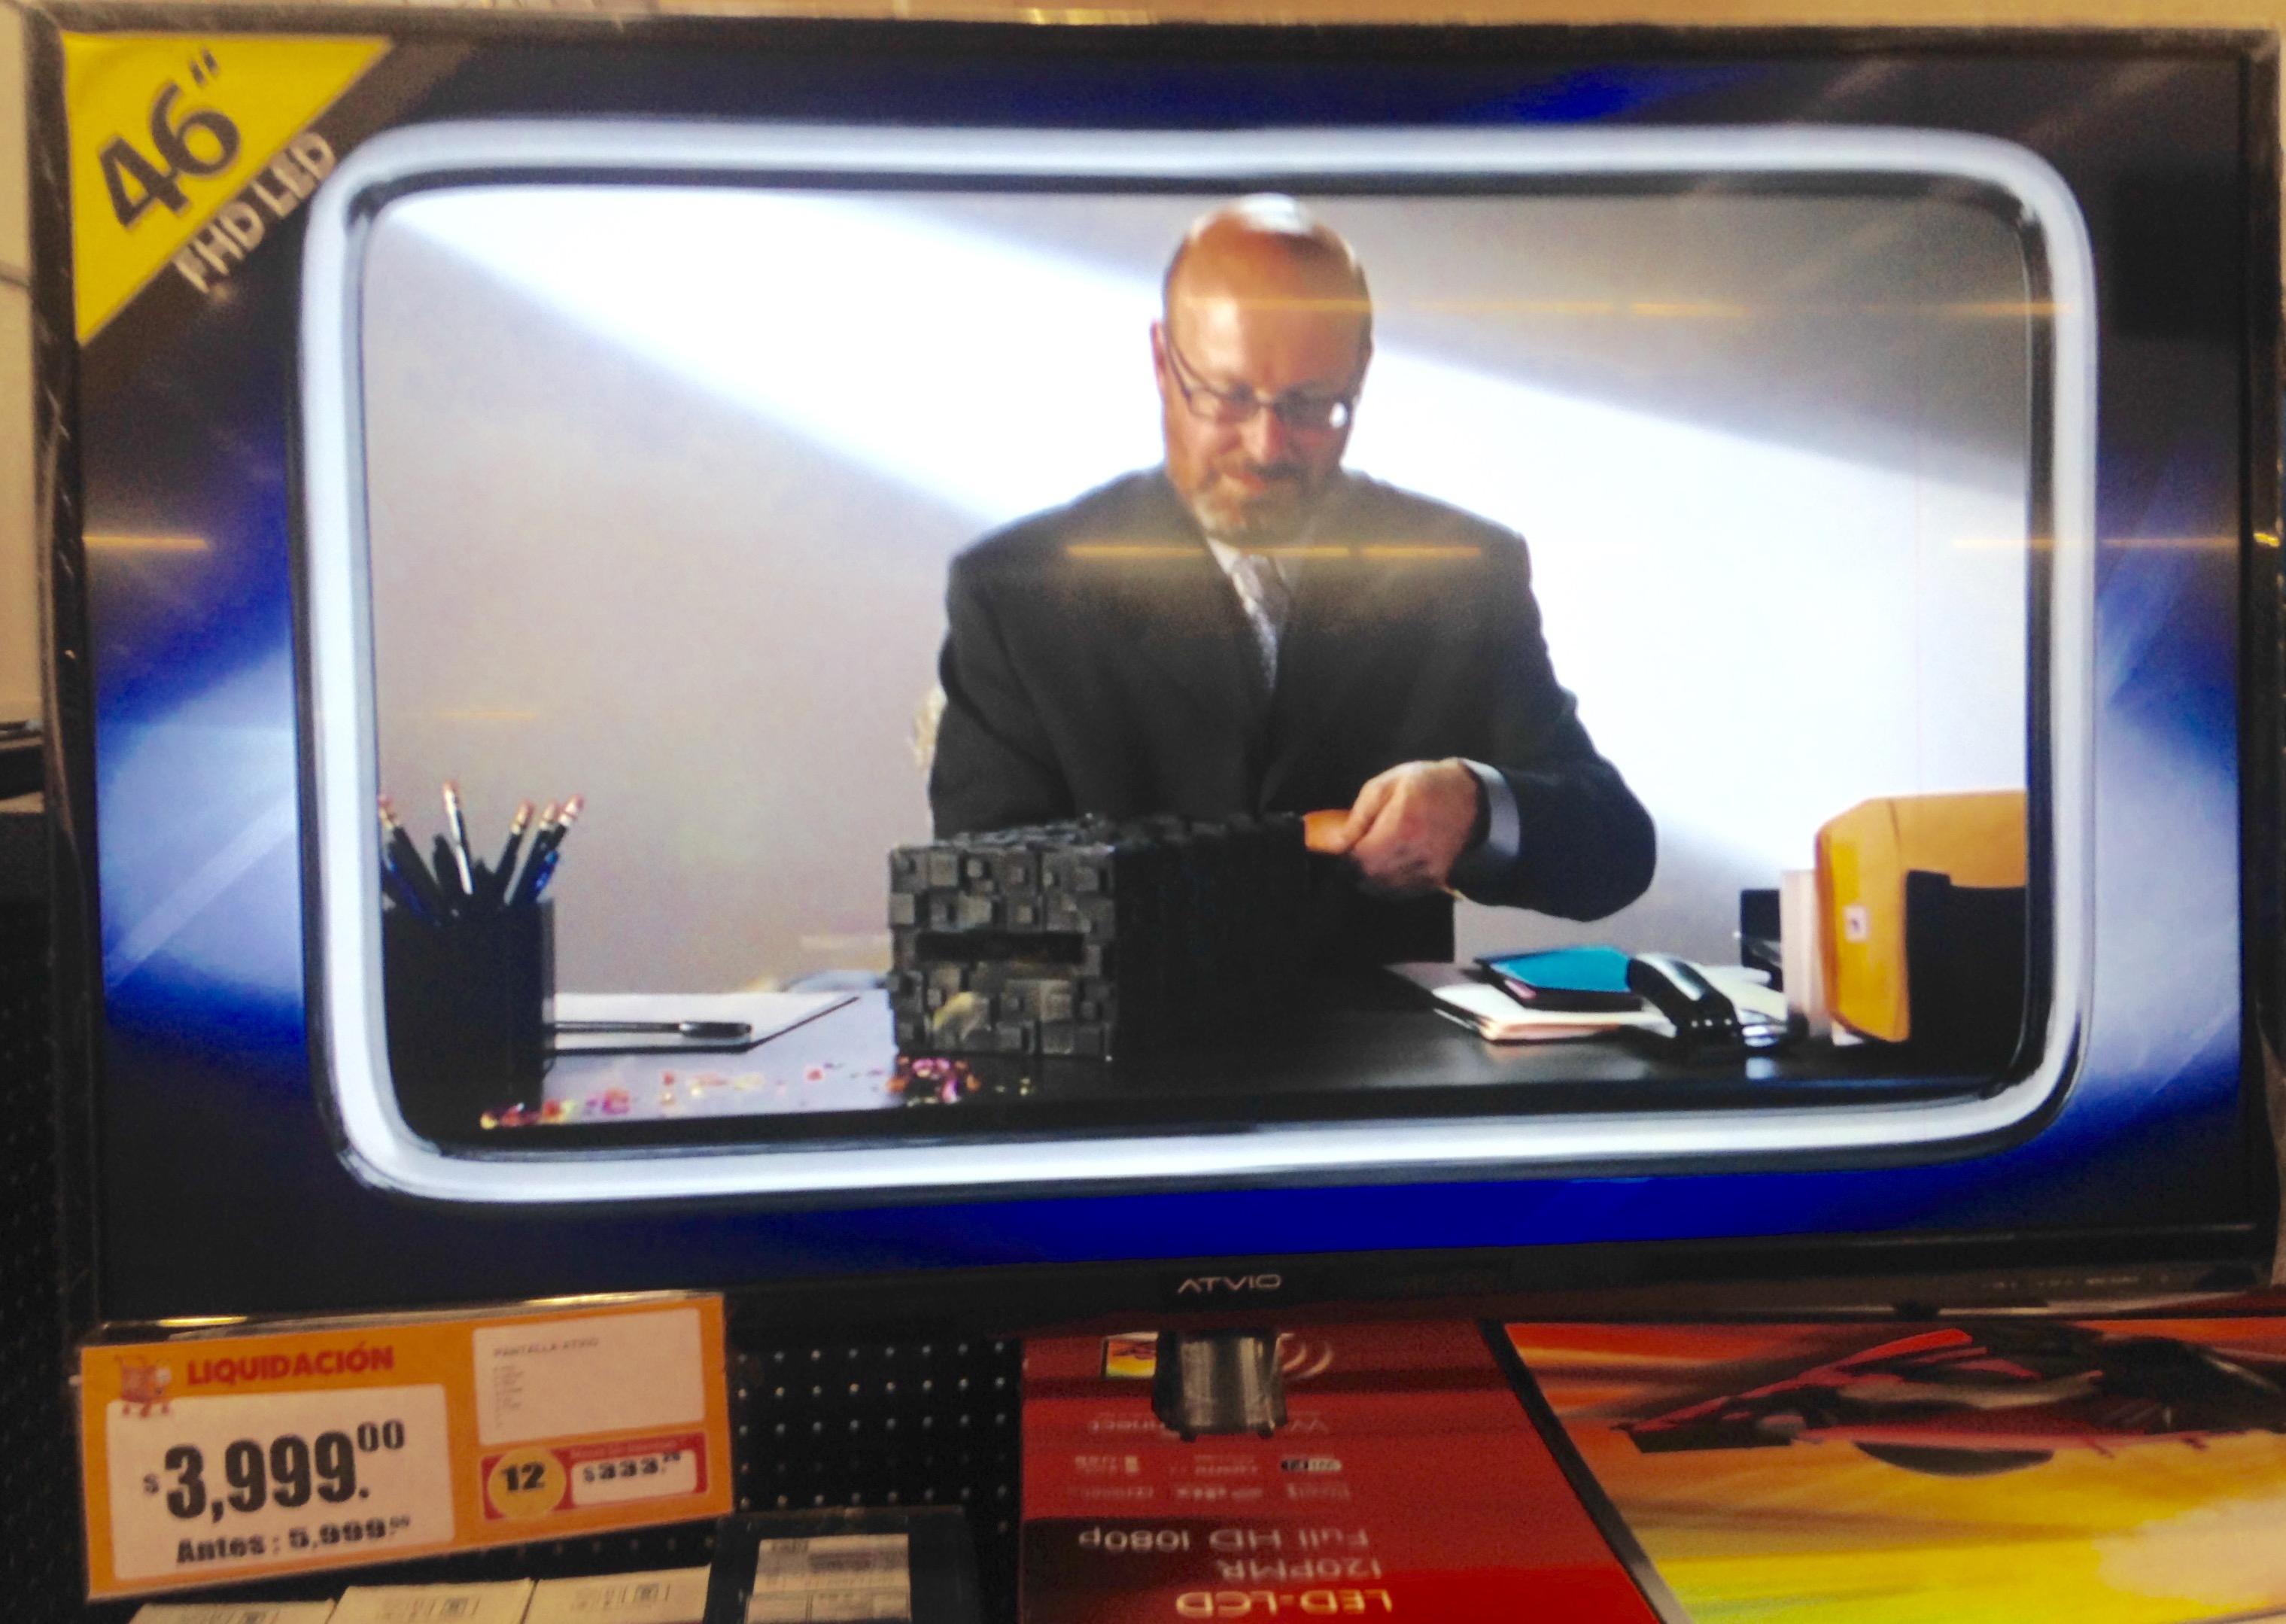 Walmart: Televisión FHD Led Marca Atvio 46 pulgadas